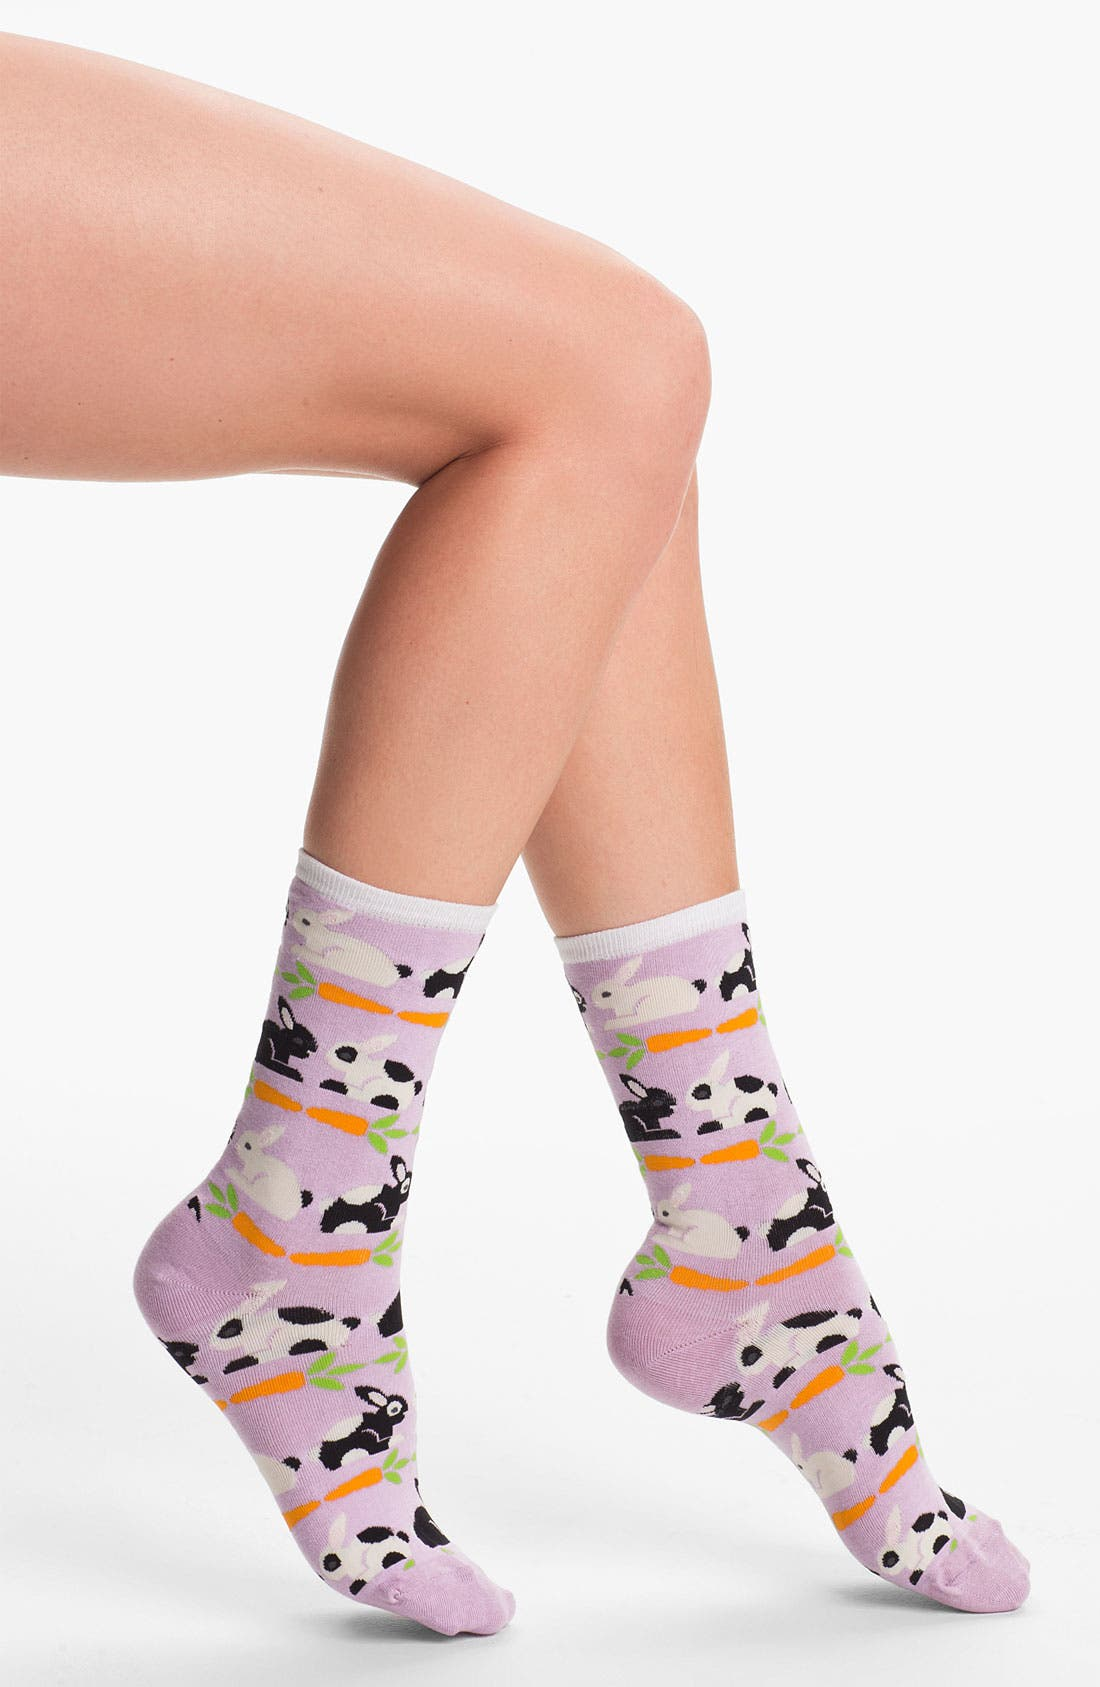 Main Image - Hot Sox 'Rabbits & Carrots' Socks